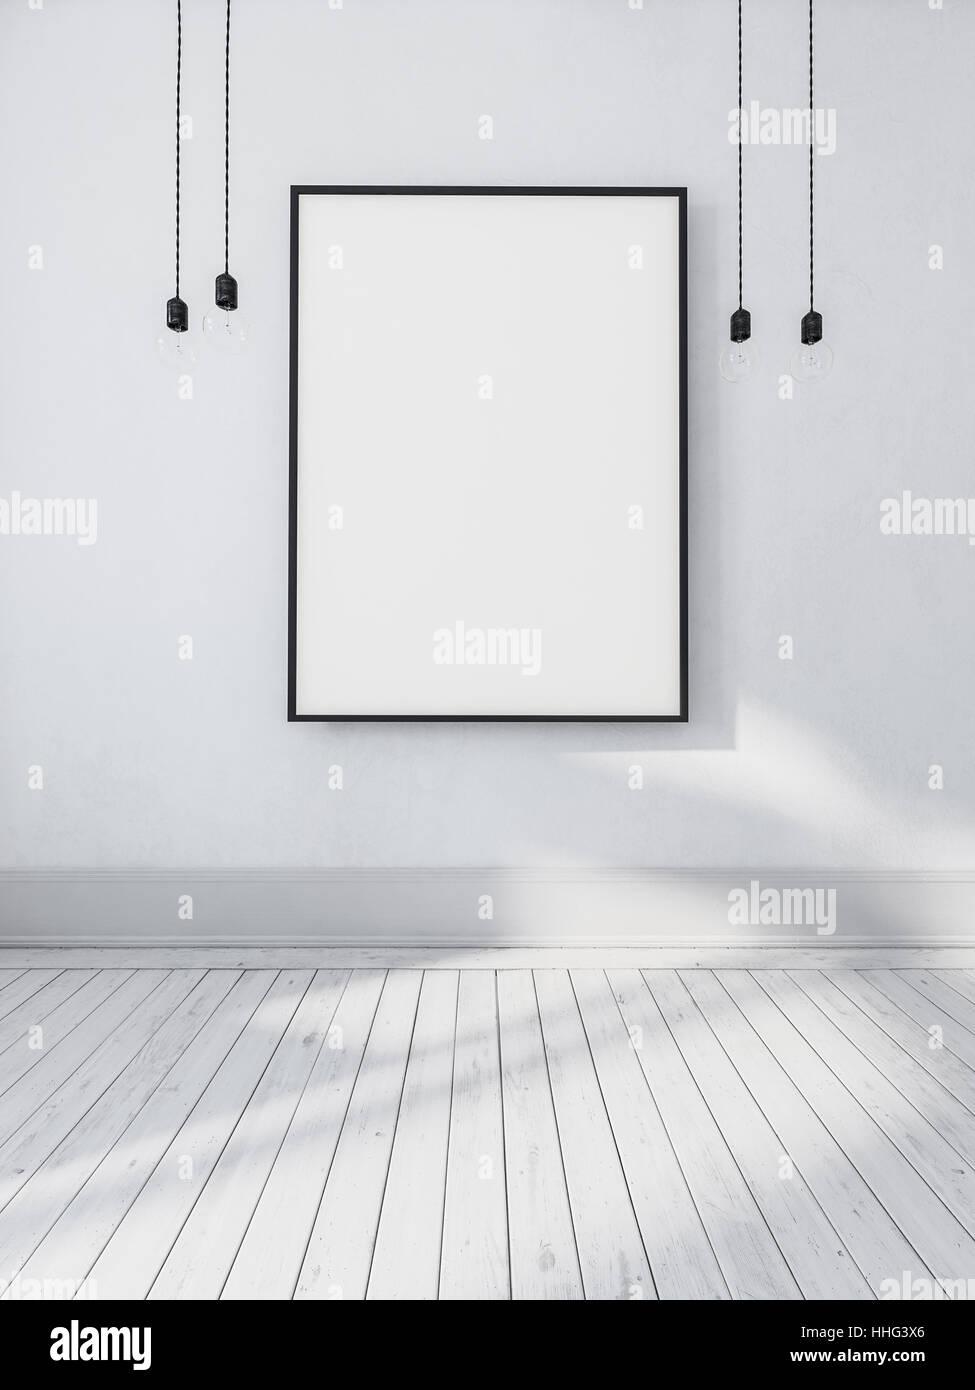 Große leere leeren rechteckigen Bilderrahmen Aufhängen an der Wand ...